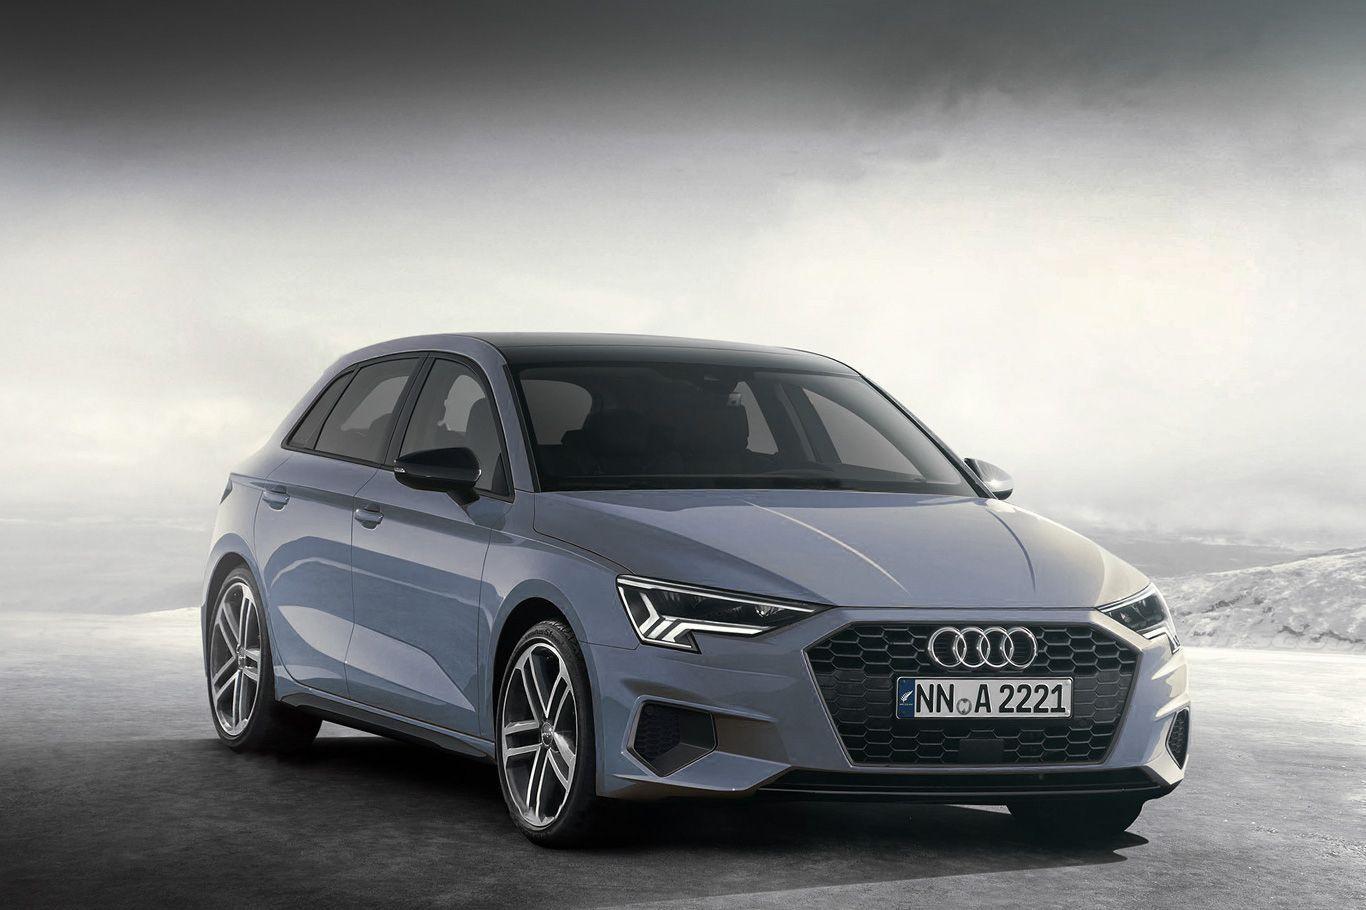 Audi S3 2020 Changes Release Date Audivehicles Audi S3 2020 Audi A3 Iv Sportback 2019 A3 Audi 2020 Audi S3 Sharper Looks New Tech A Audi Audi Cars Audi A3